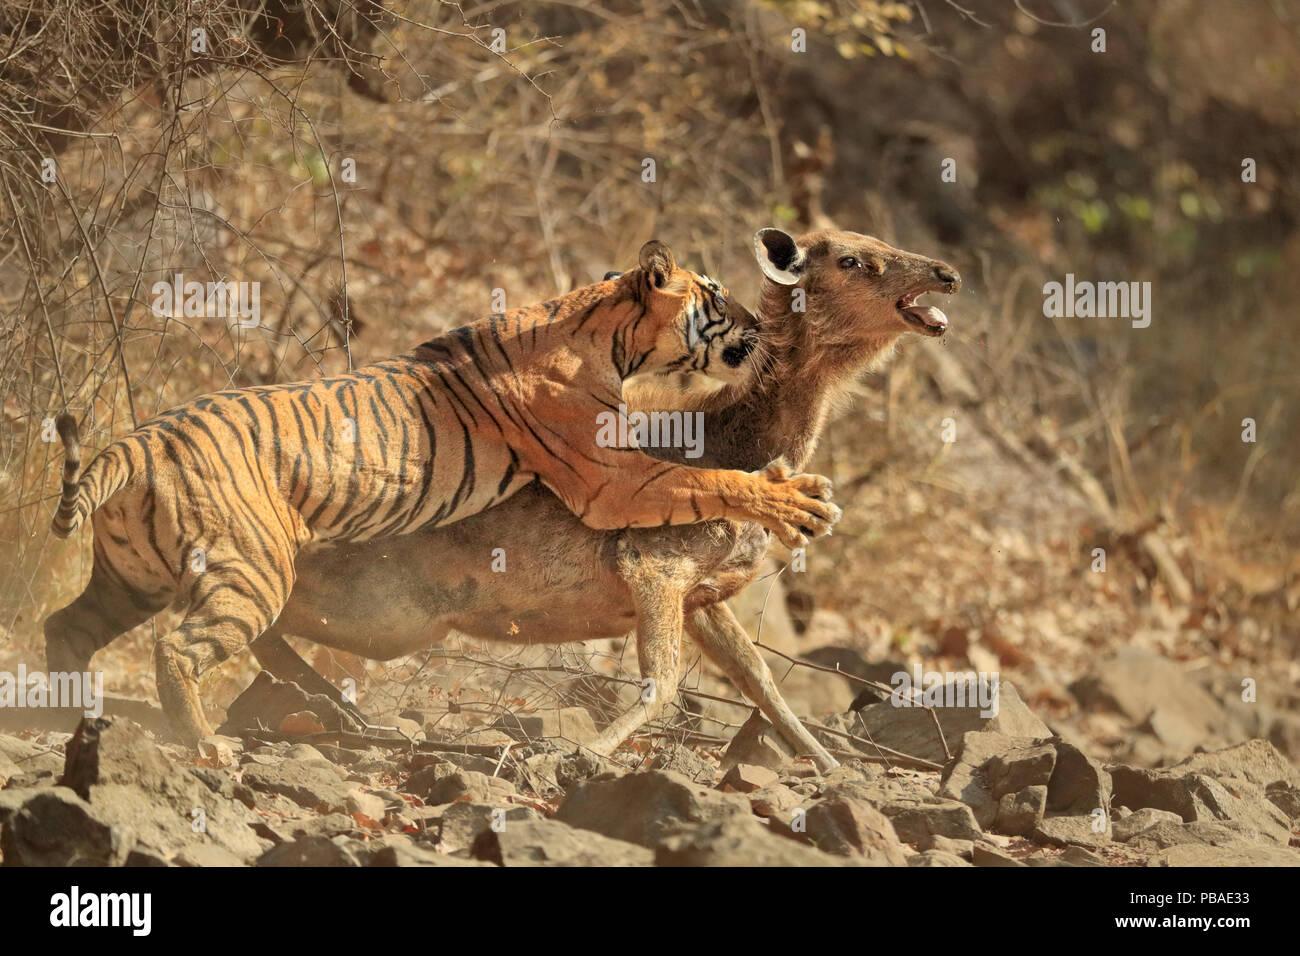 Bengal tiger (Panthera tigris tigris) female 'Noor T19' bringing down Sambar deer (Rusa unicolor) Ranthambhore, India. Sequence 6 of 18. - Stock Image